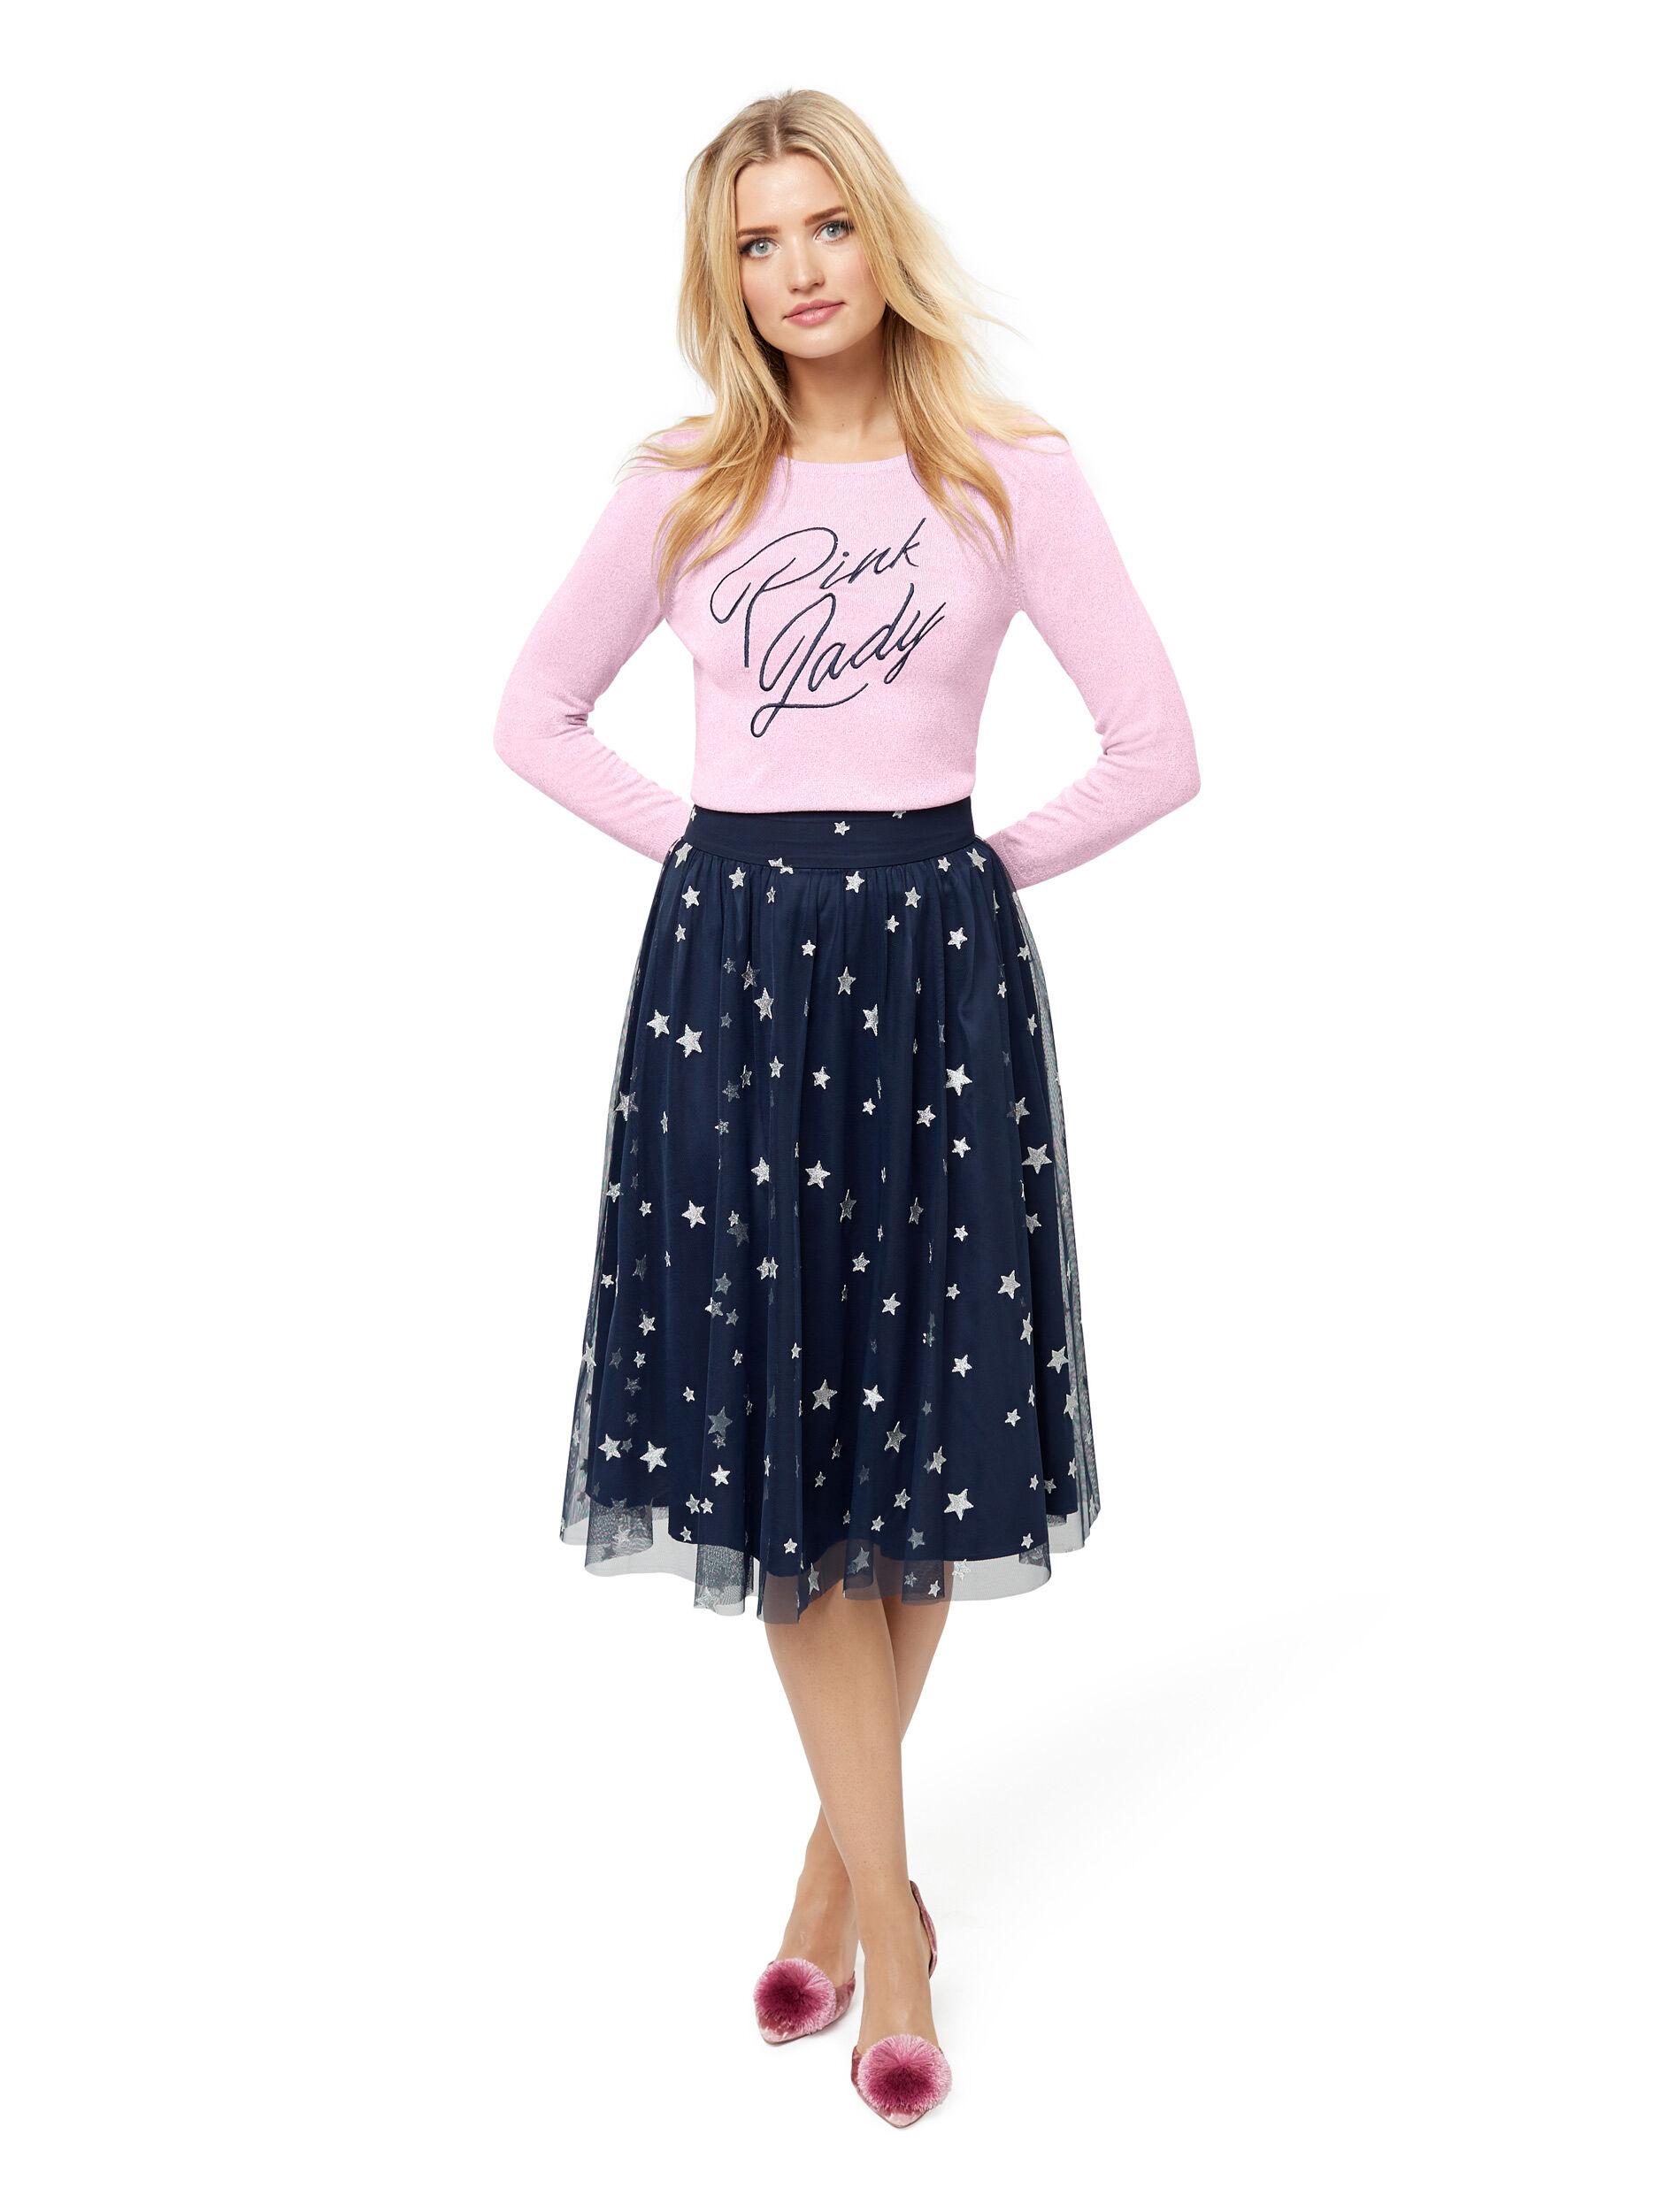 Pink Lady Jumper